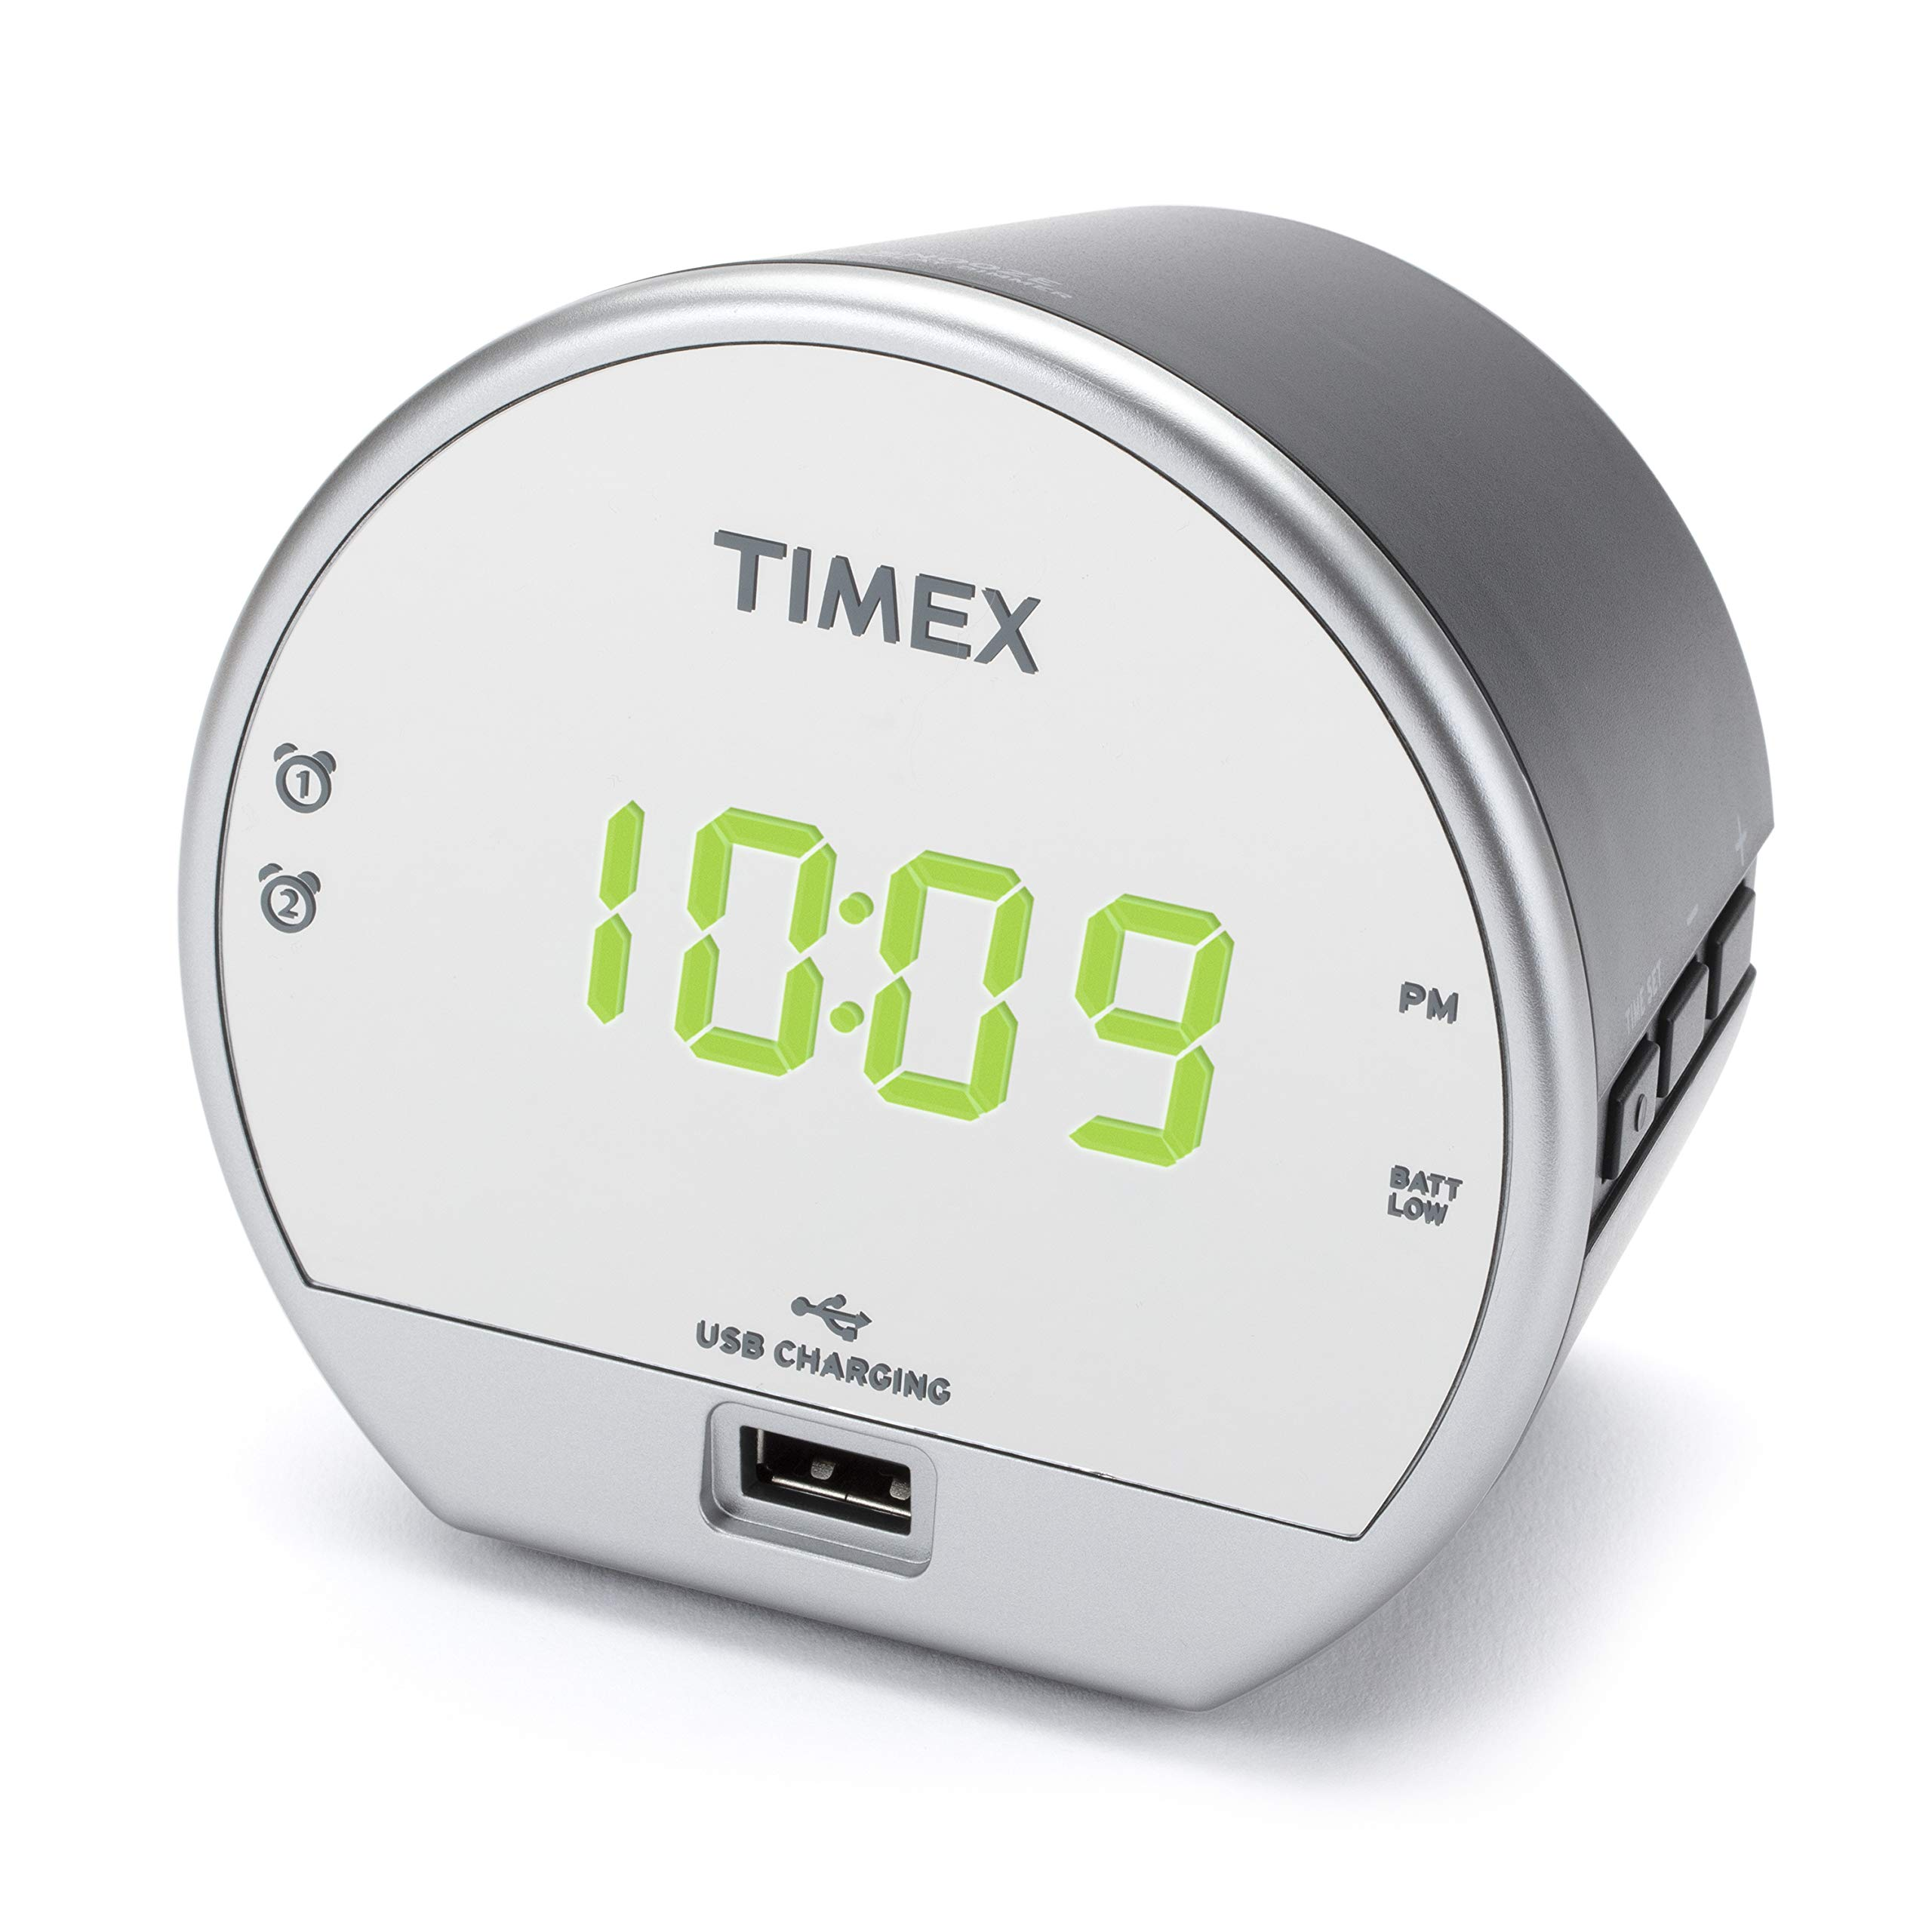 Timex Digital Bedrooms Adjustable T1212